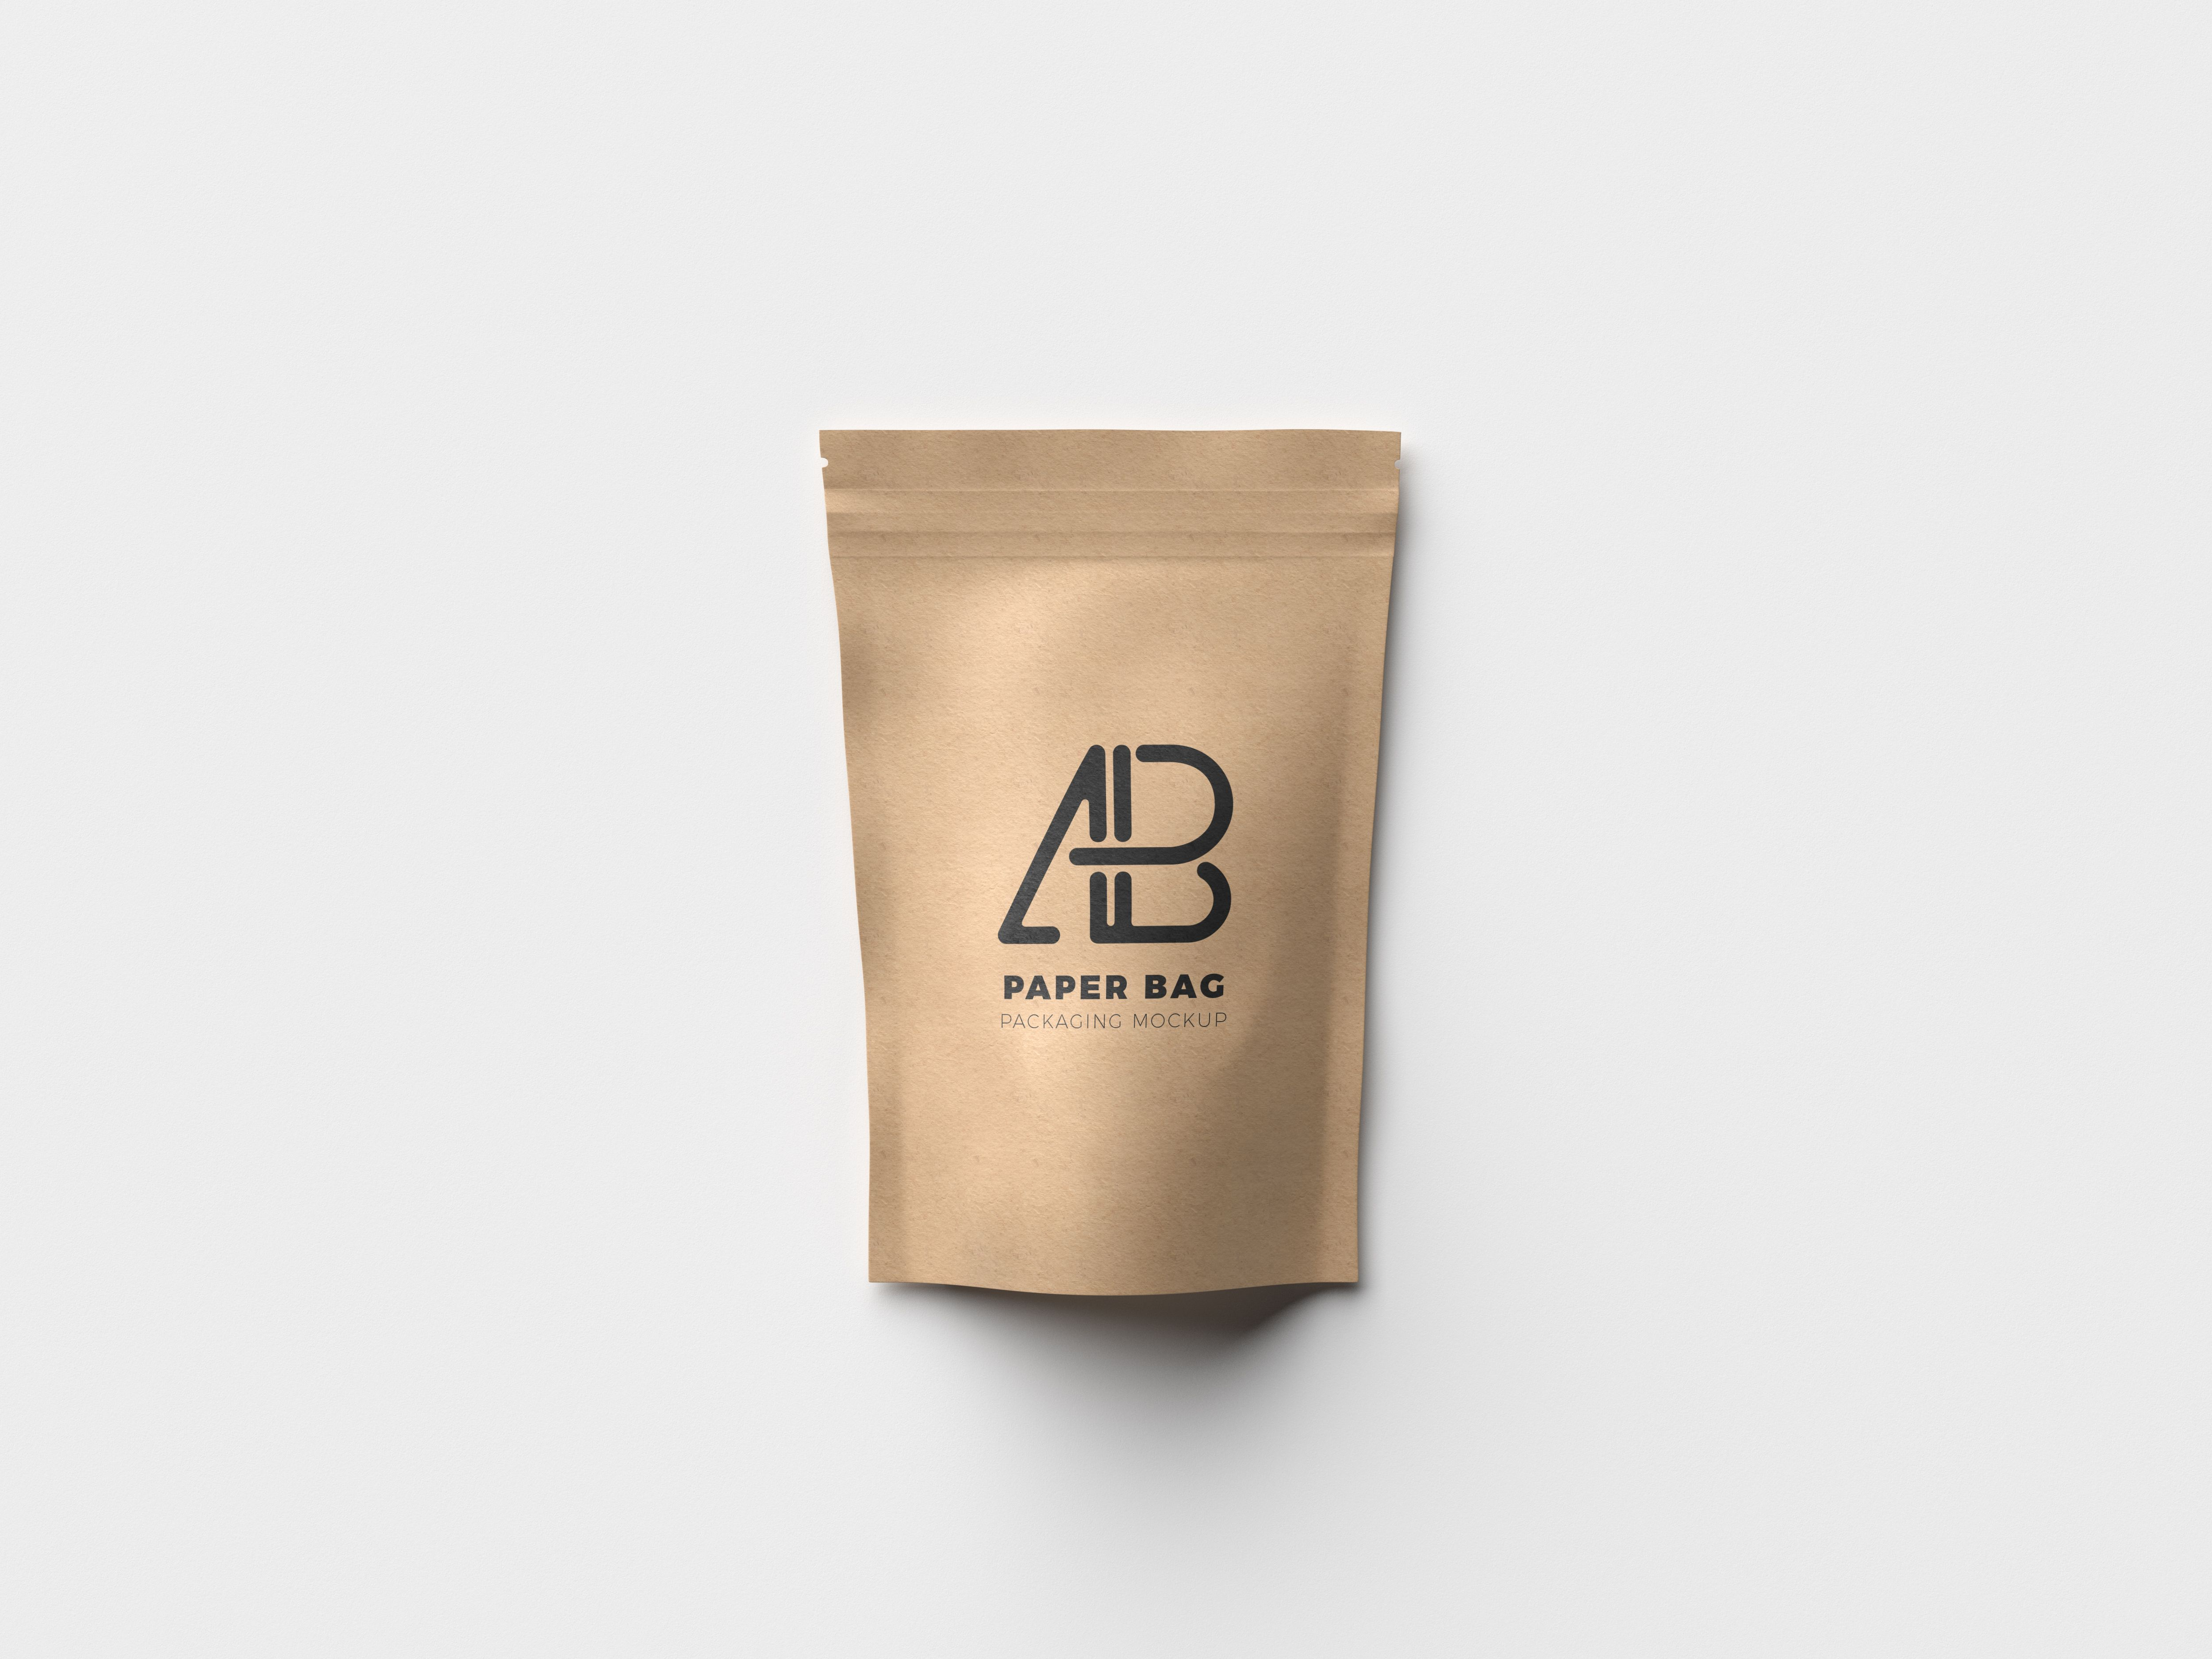 Paper Bag Packaging Mockup | Mockups | Bag packaging, Bag mockup, Mockup